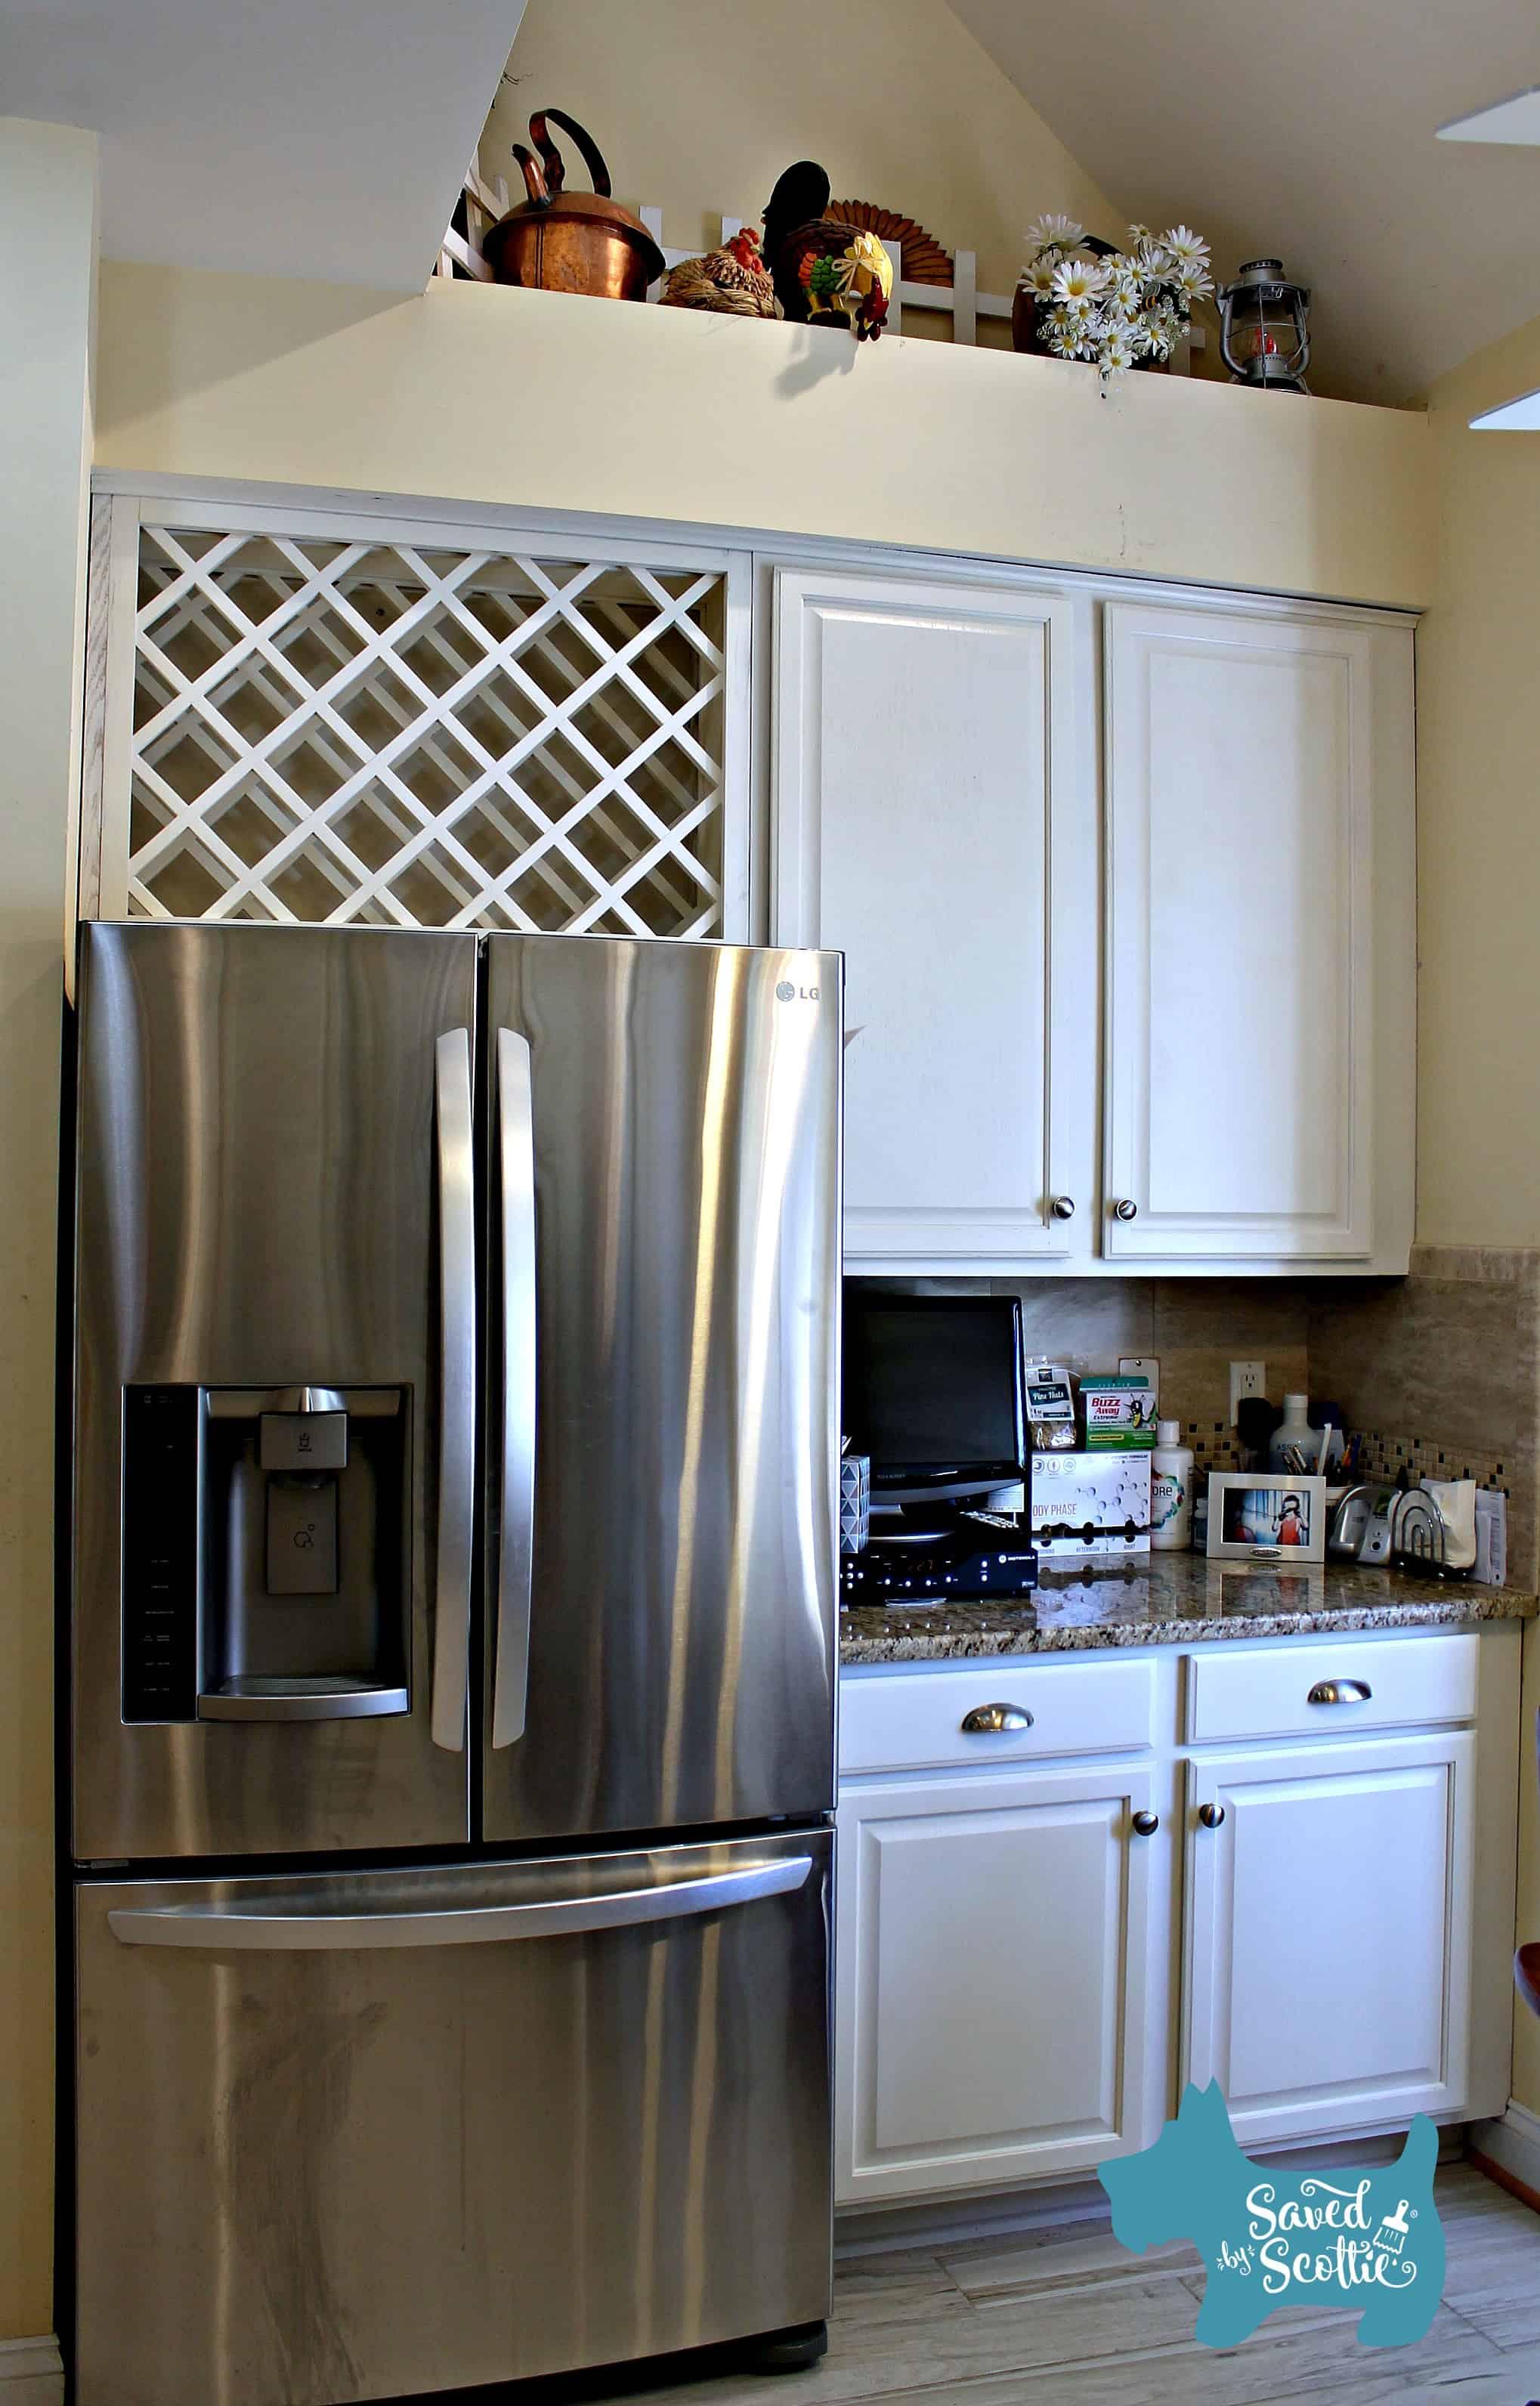 Saved by Scottie Alamo kitchen fridge after